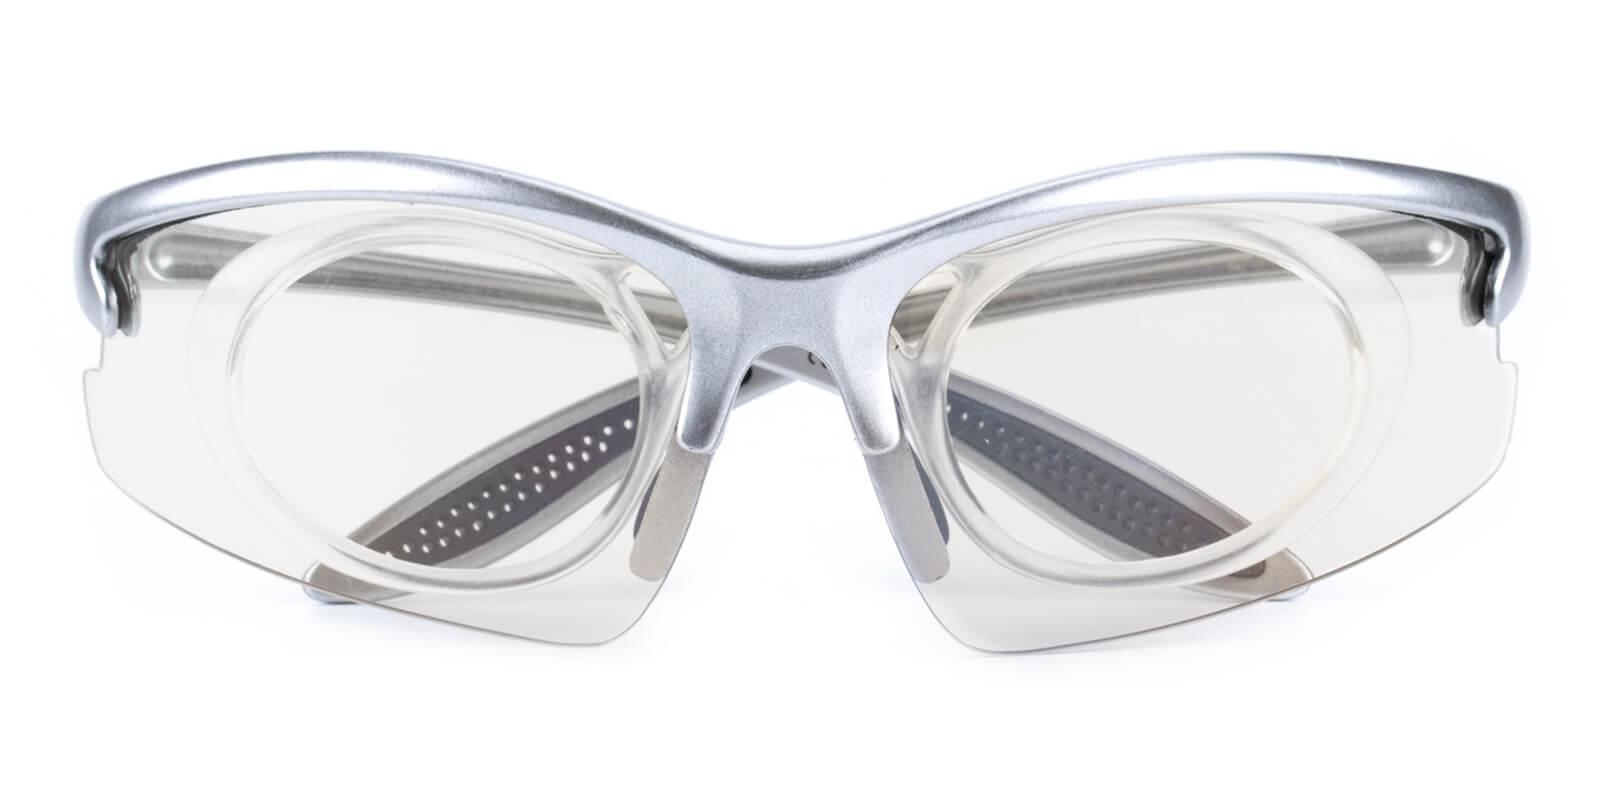 Windrise-Silver-Square-Plastic-SportsGlasses-detail